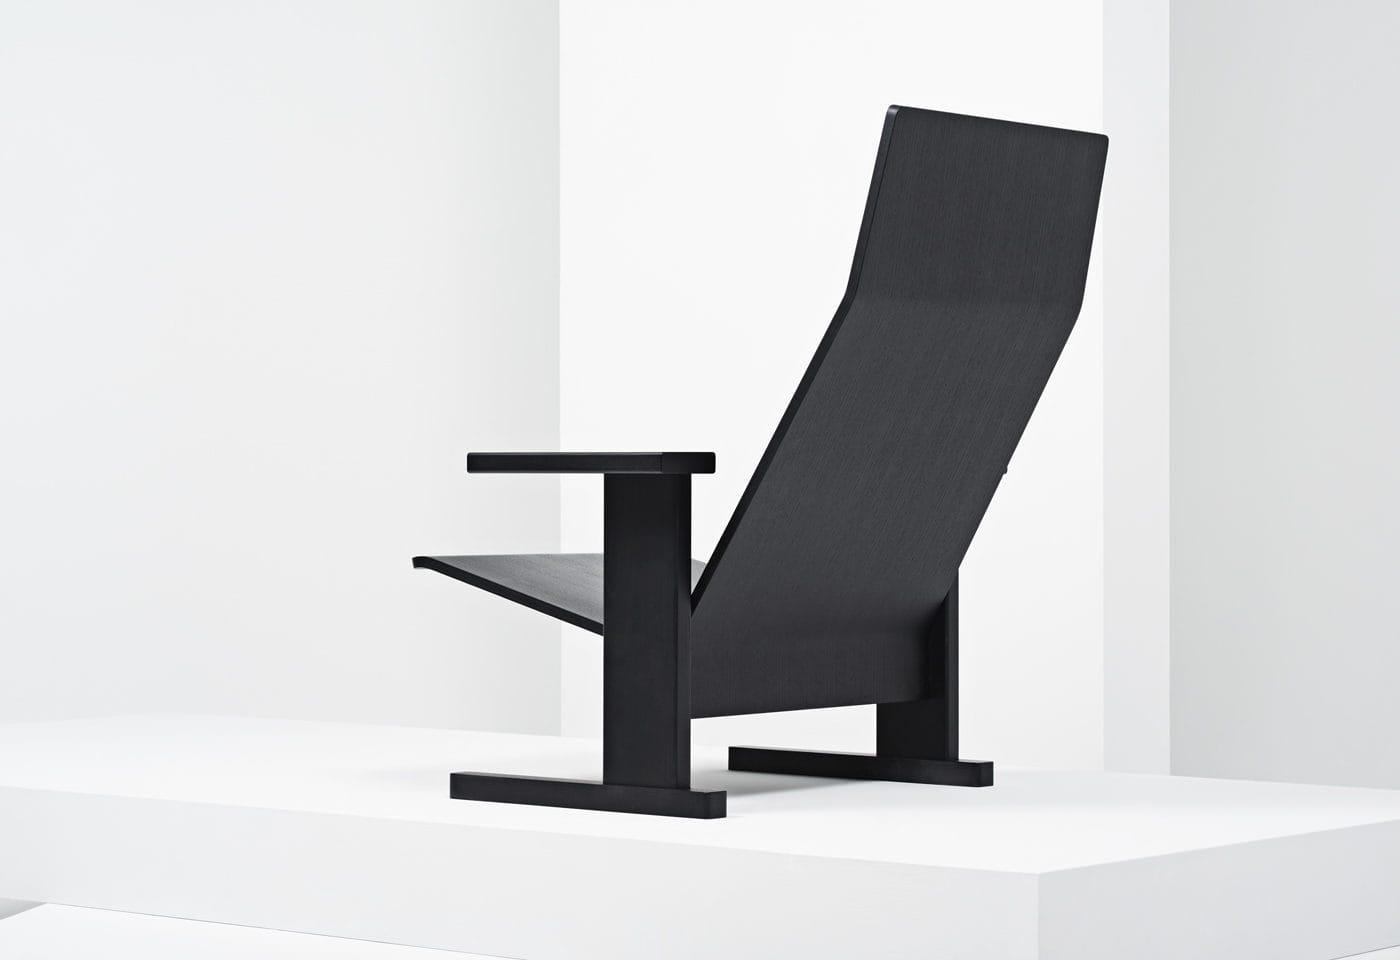 mc15 quindici collection by ronan erwan bouroullec for mattiazzi. Black Bedroom Furniture Sets. Home Design Ideas